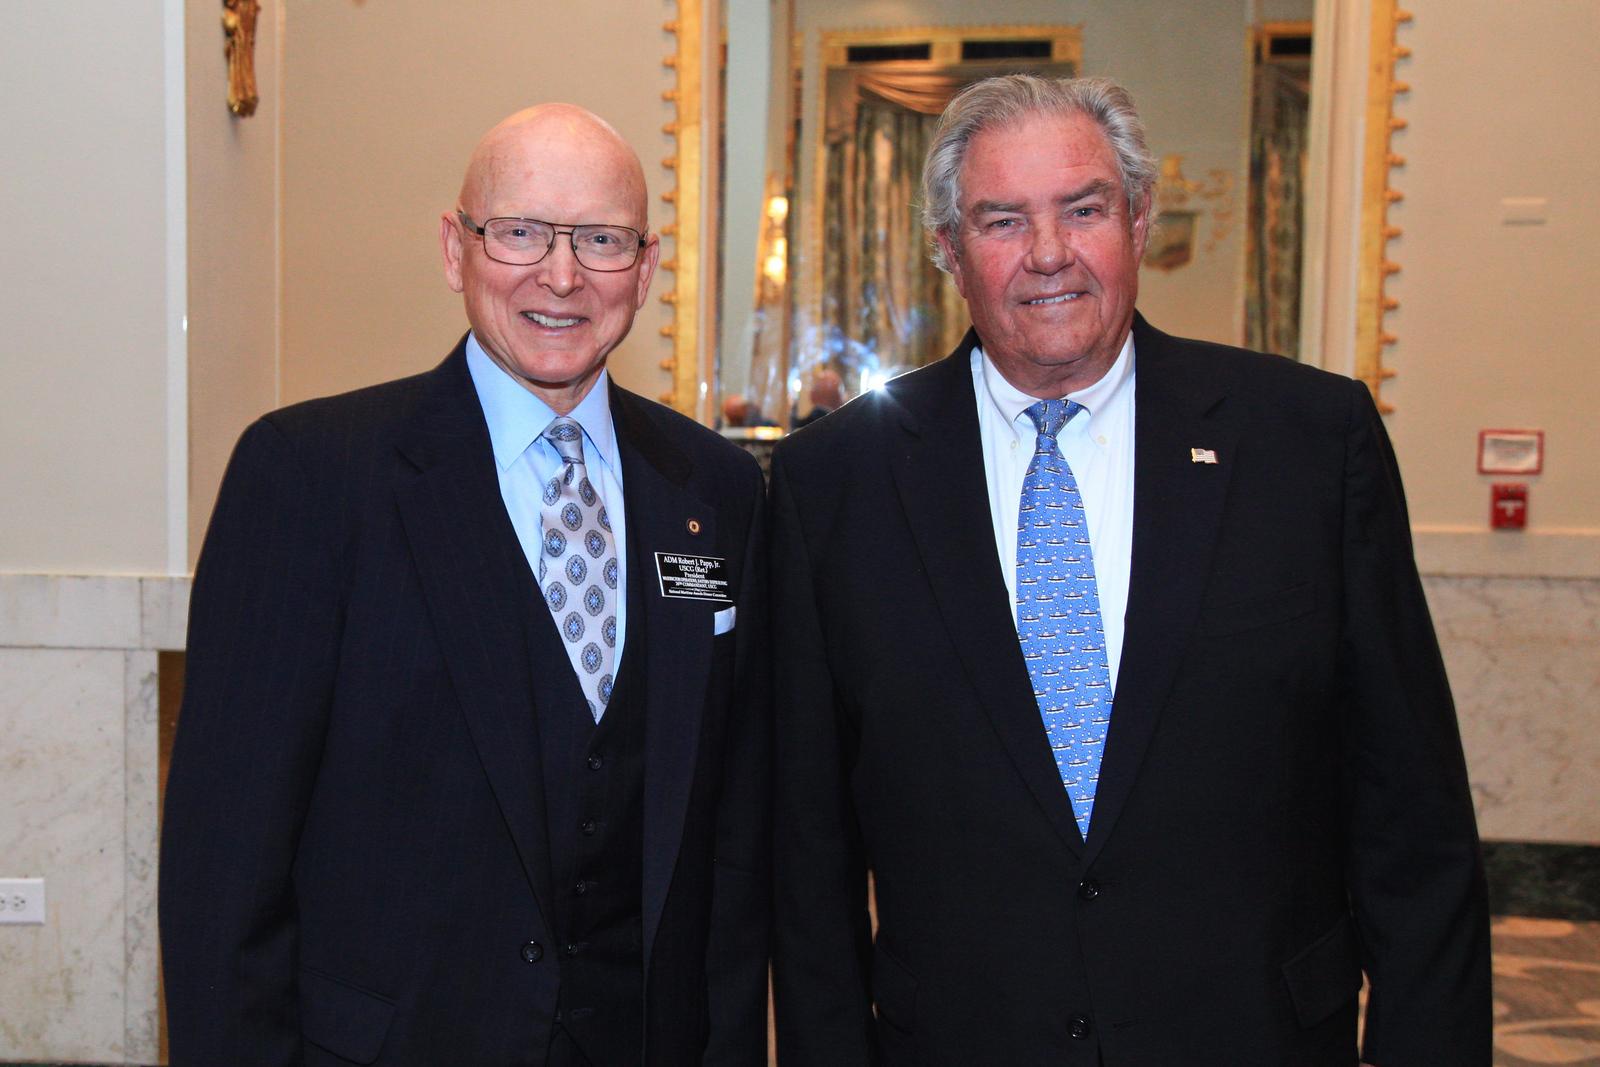 Admiral Robert J. Papp, Jr. USCG (Ret.) and Boysie Bollinger